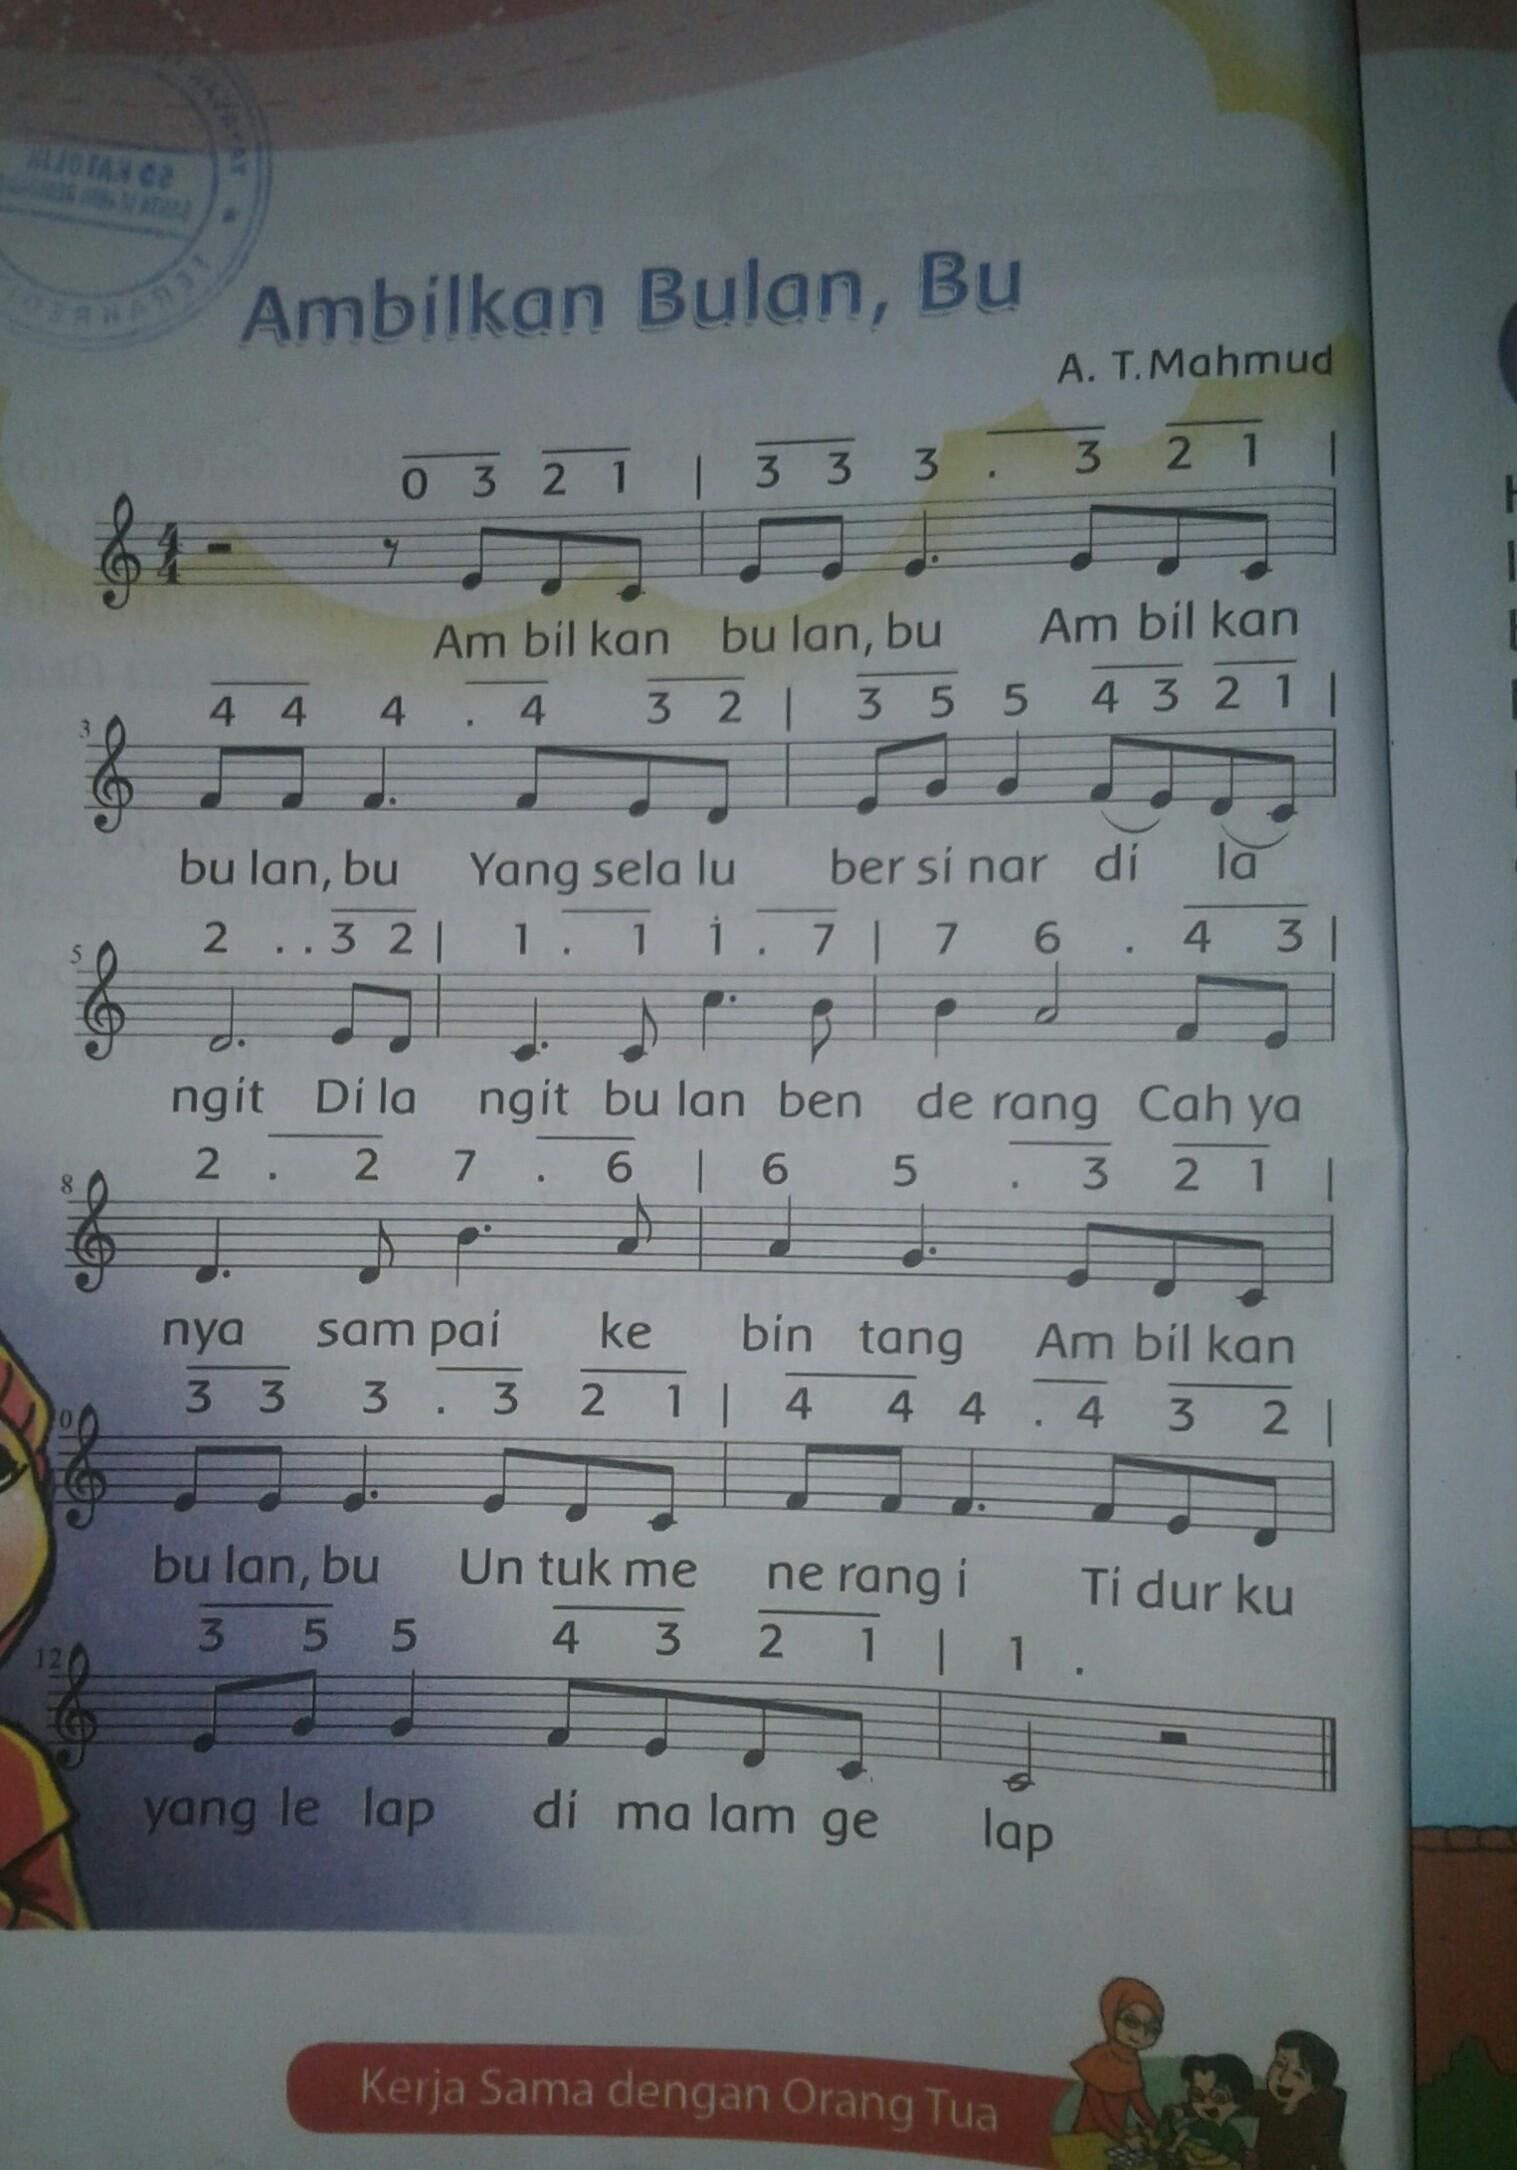 Lagu Yang Menggunakan Tempo Cepat Adalah : menggunakan, tempo, cepat, adalah, Tuliskan., Baris, Ambilkan, Bulan, Dinyanyikan, Dengan, Tempo, Cepat, Lambat, Brainly.co.id